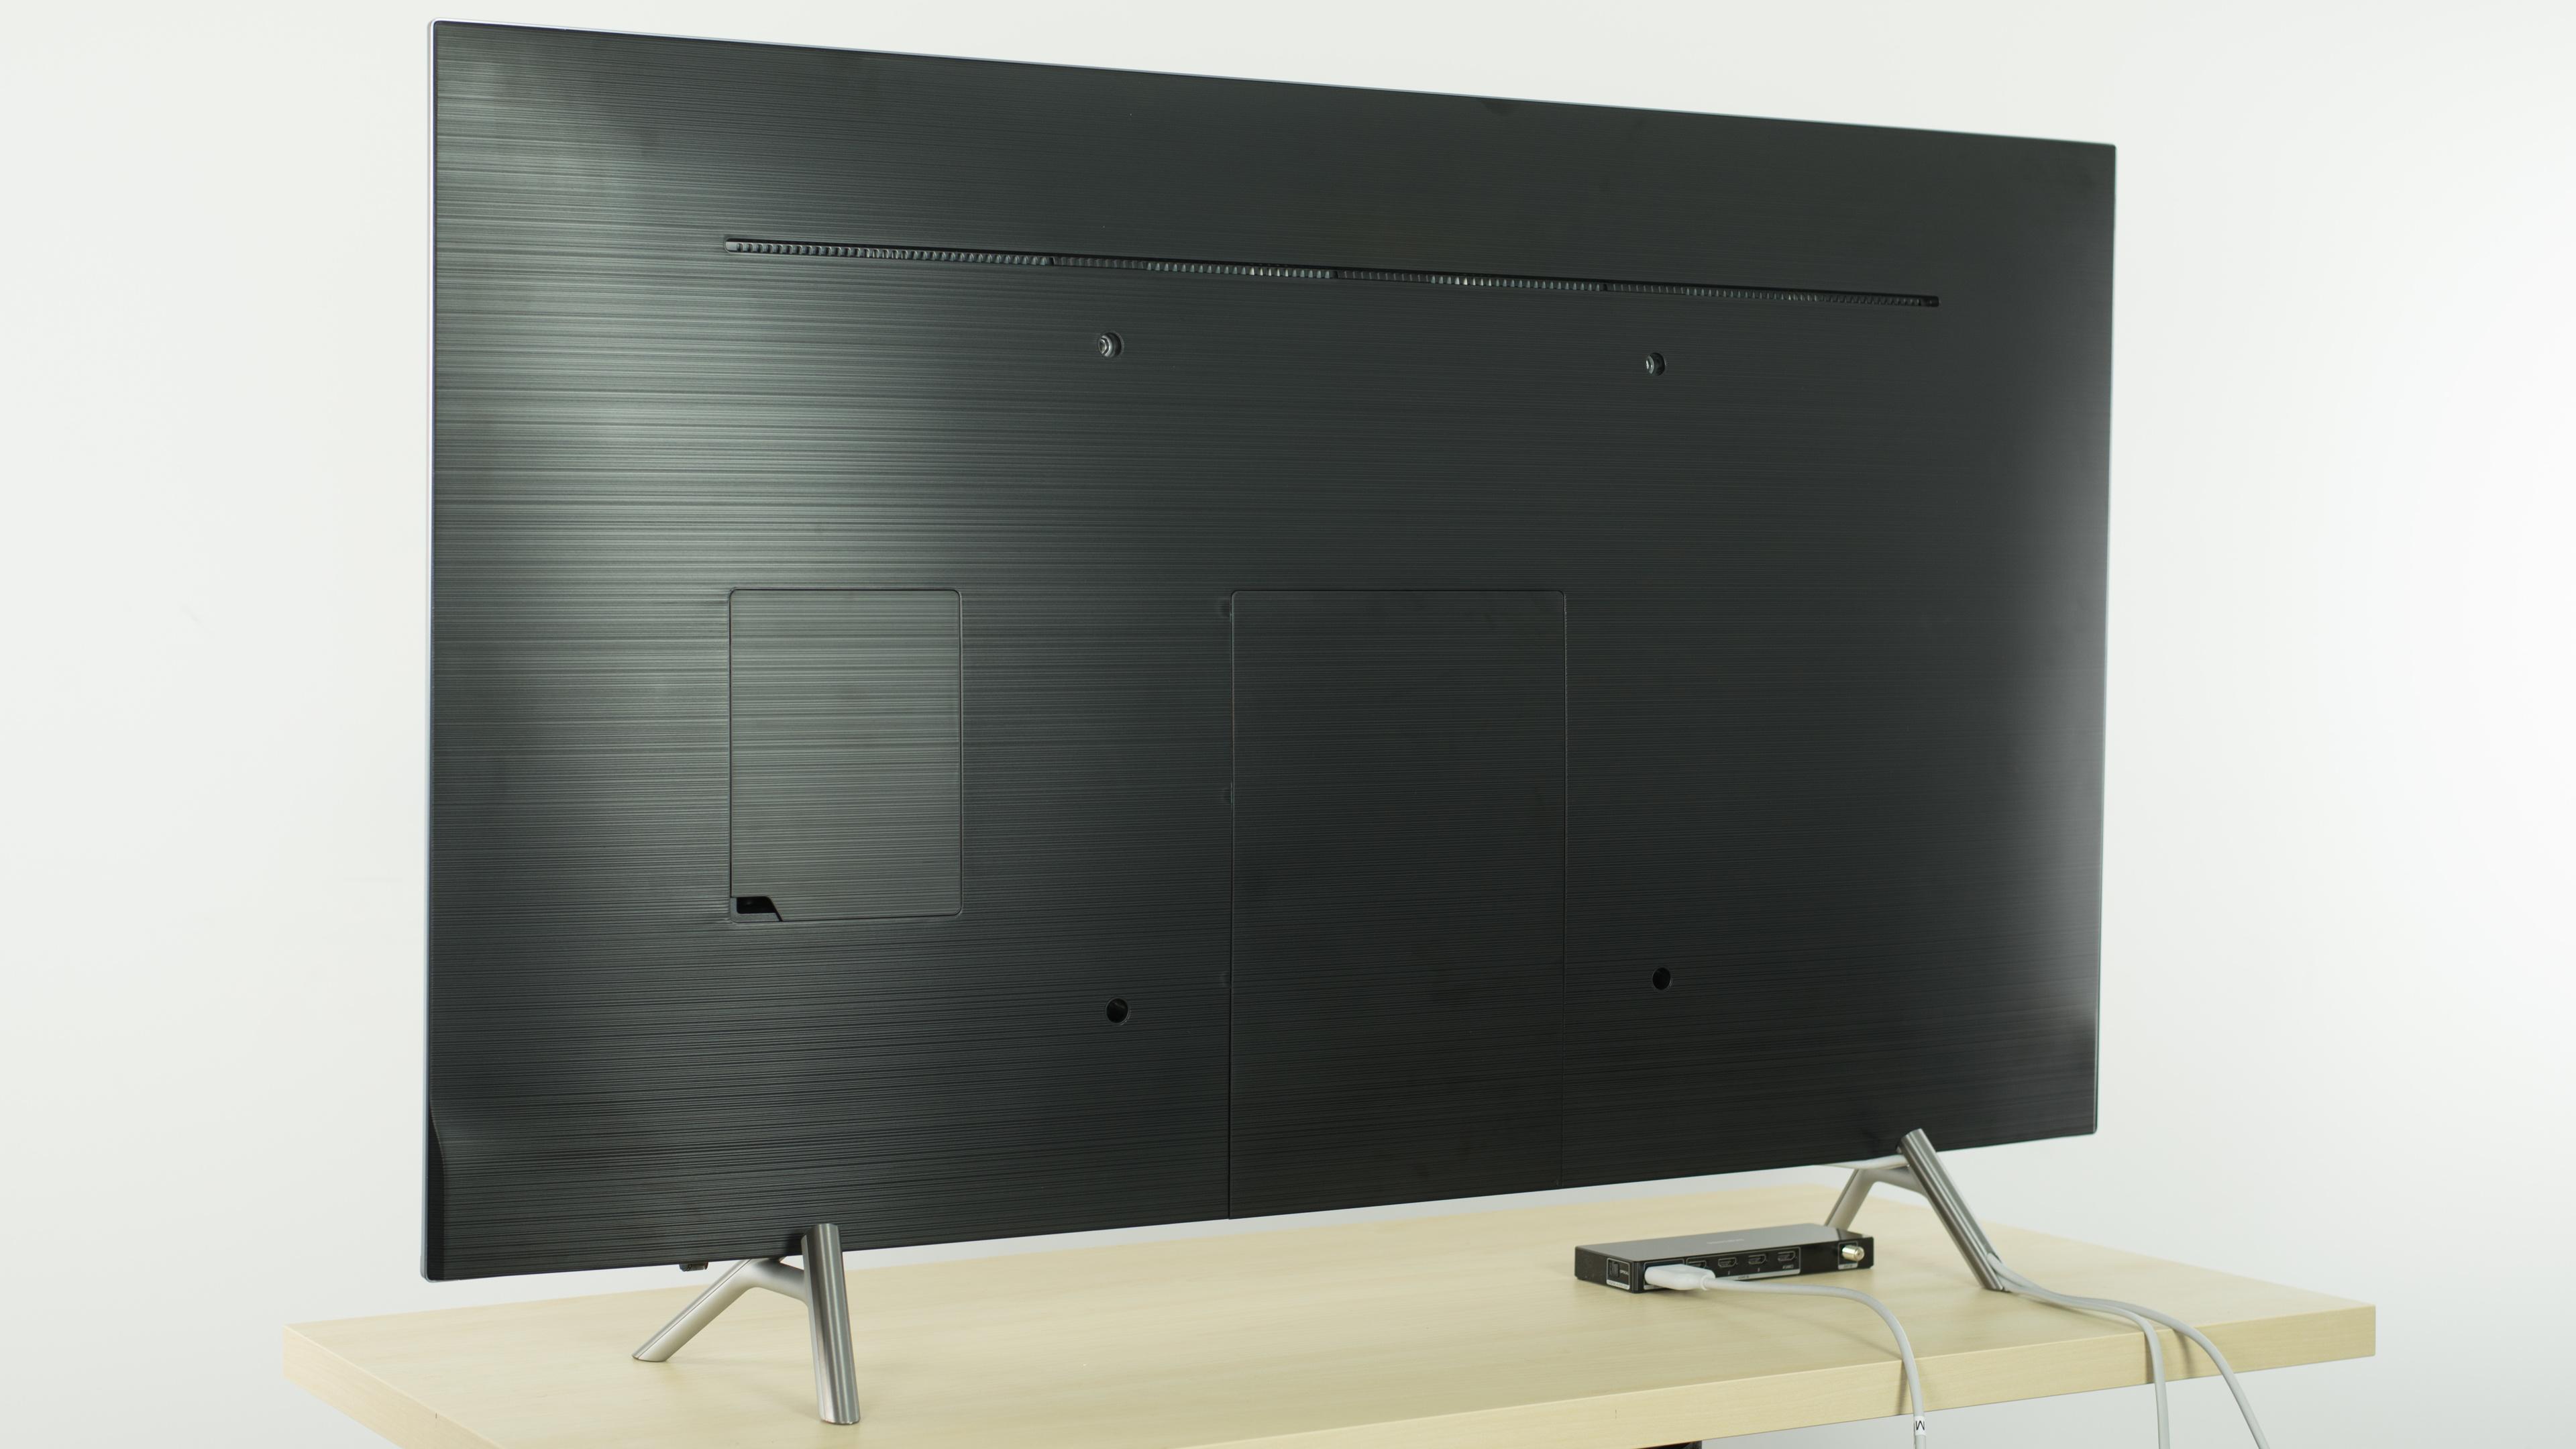 samsung mu8000 review un49mu8000 un55mu8000 un65mu8000 rh rtings com samsung series 8000 led tv user manual samsung series 8000 led tv user manual